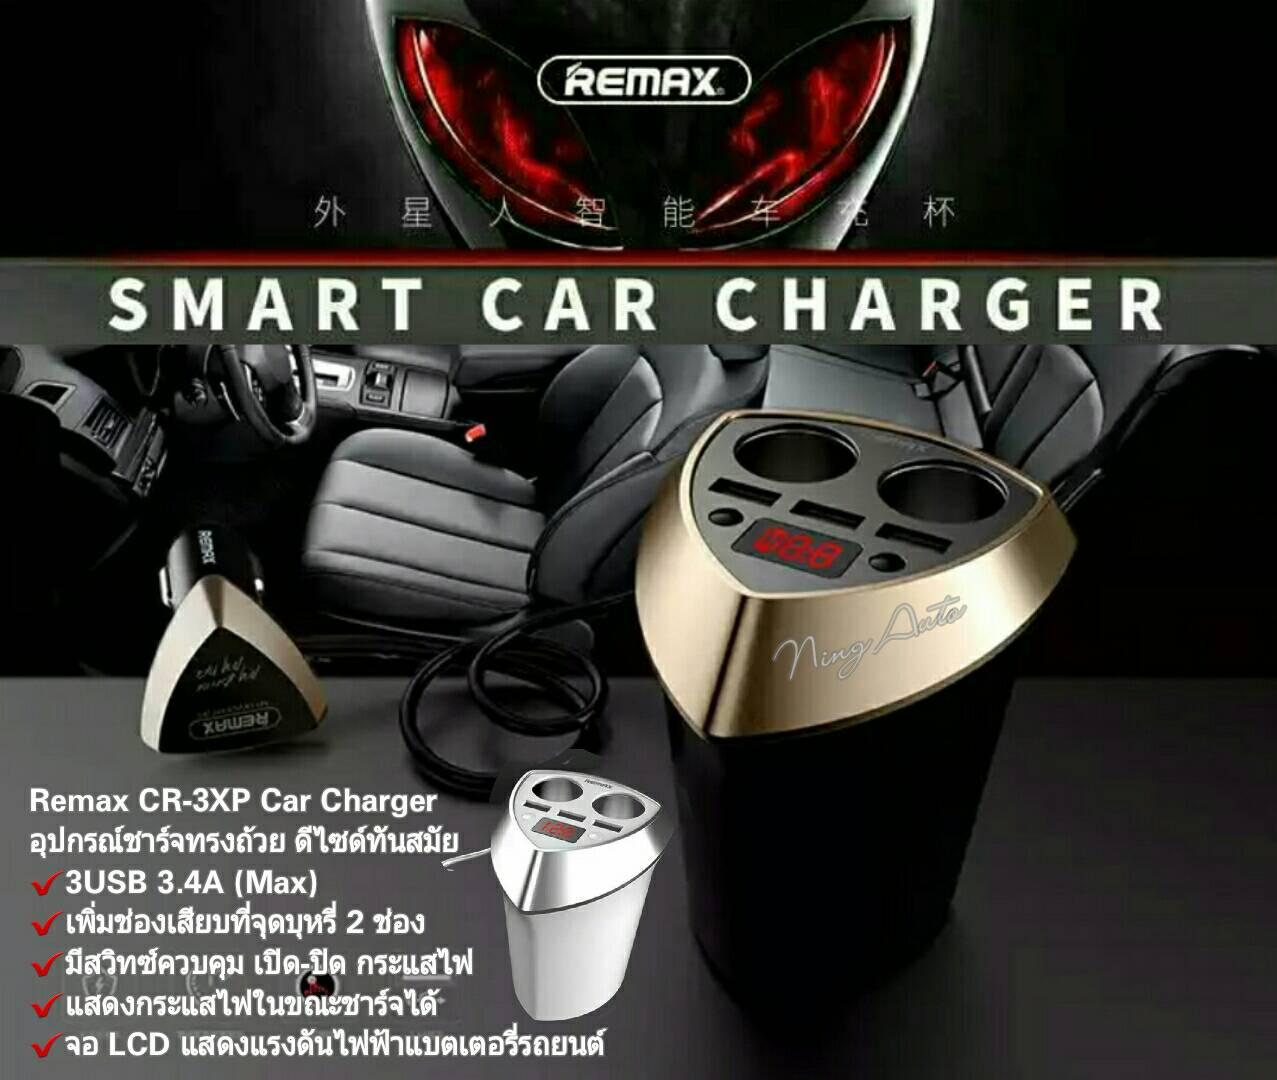 Remax CR-3XP Car Charger อุปกรณ์ชาร์จทรงถ้วย